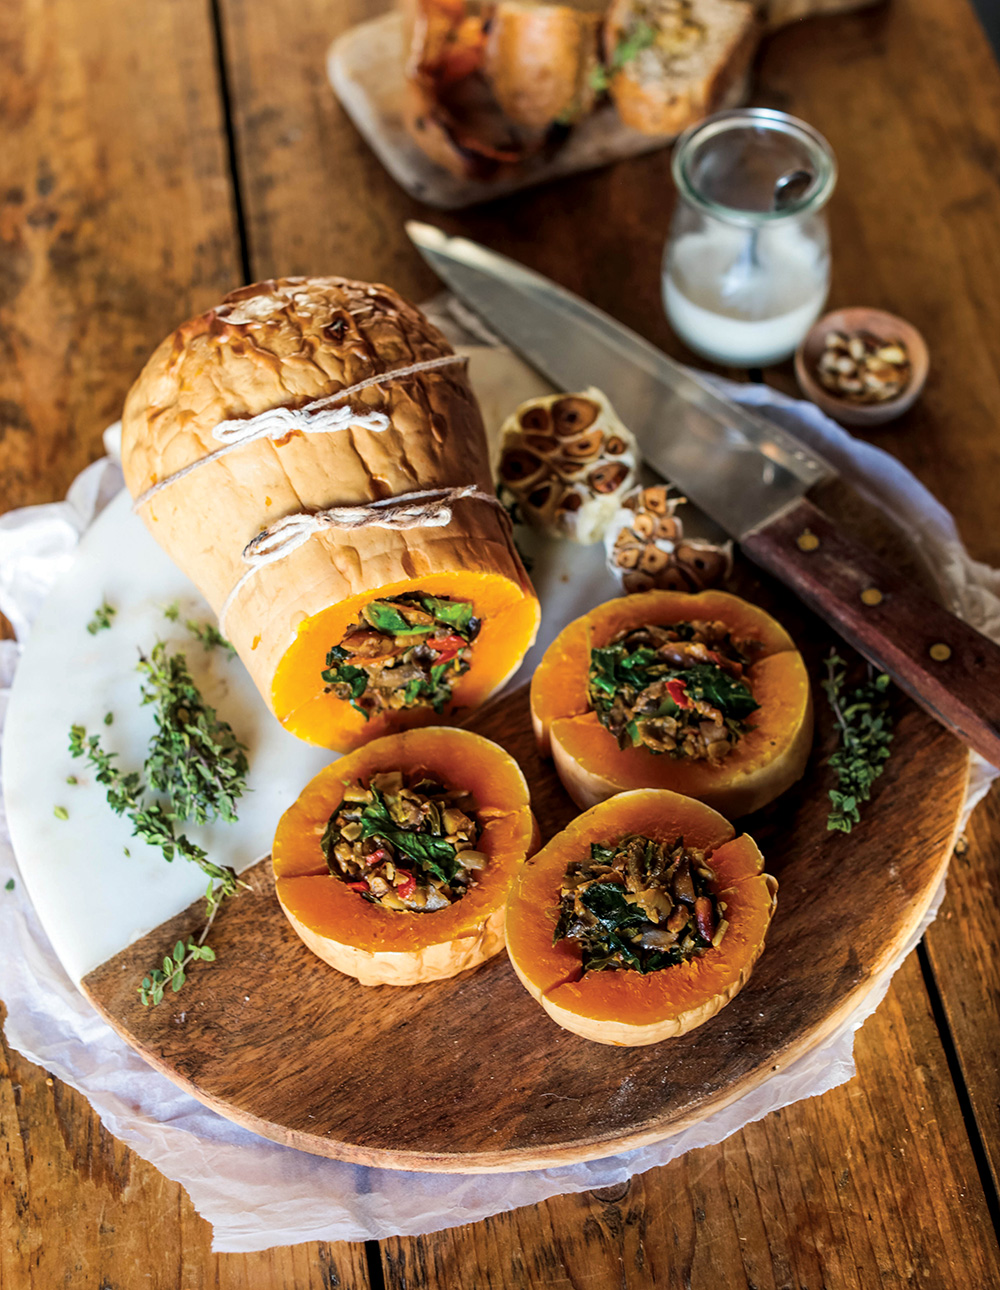 Vegan Baked Squash with Nutty Mushroom Stuffing